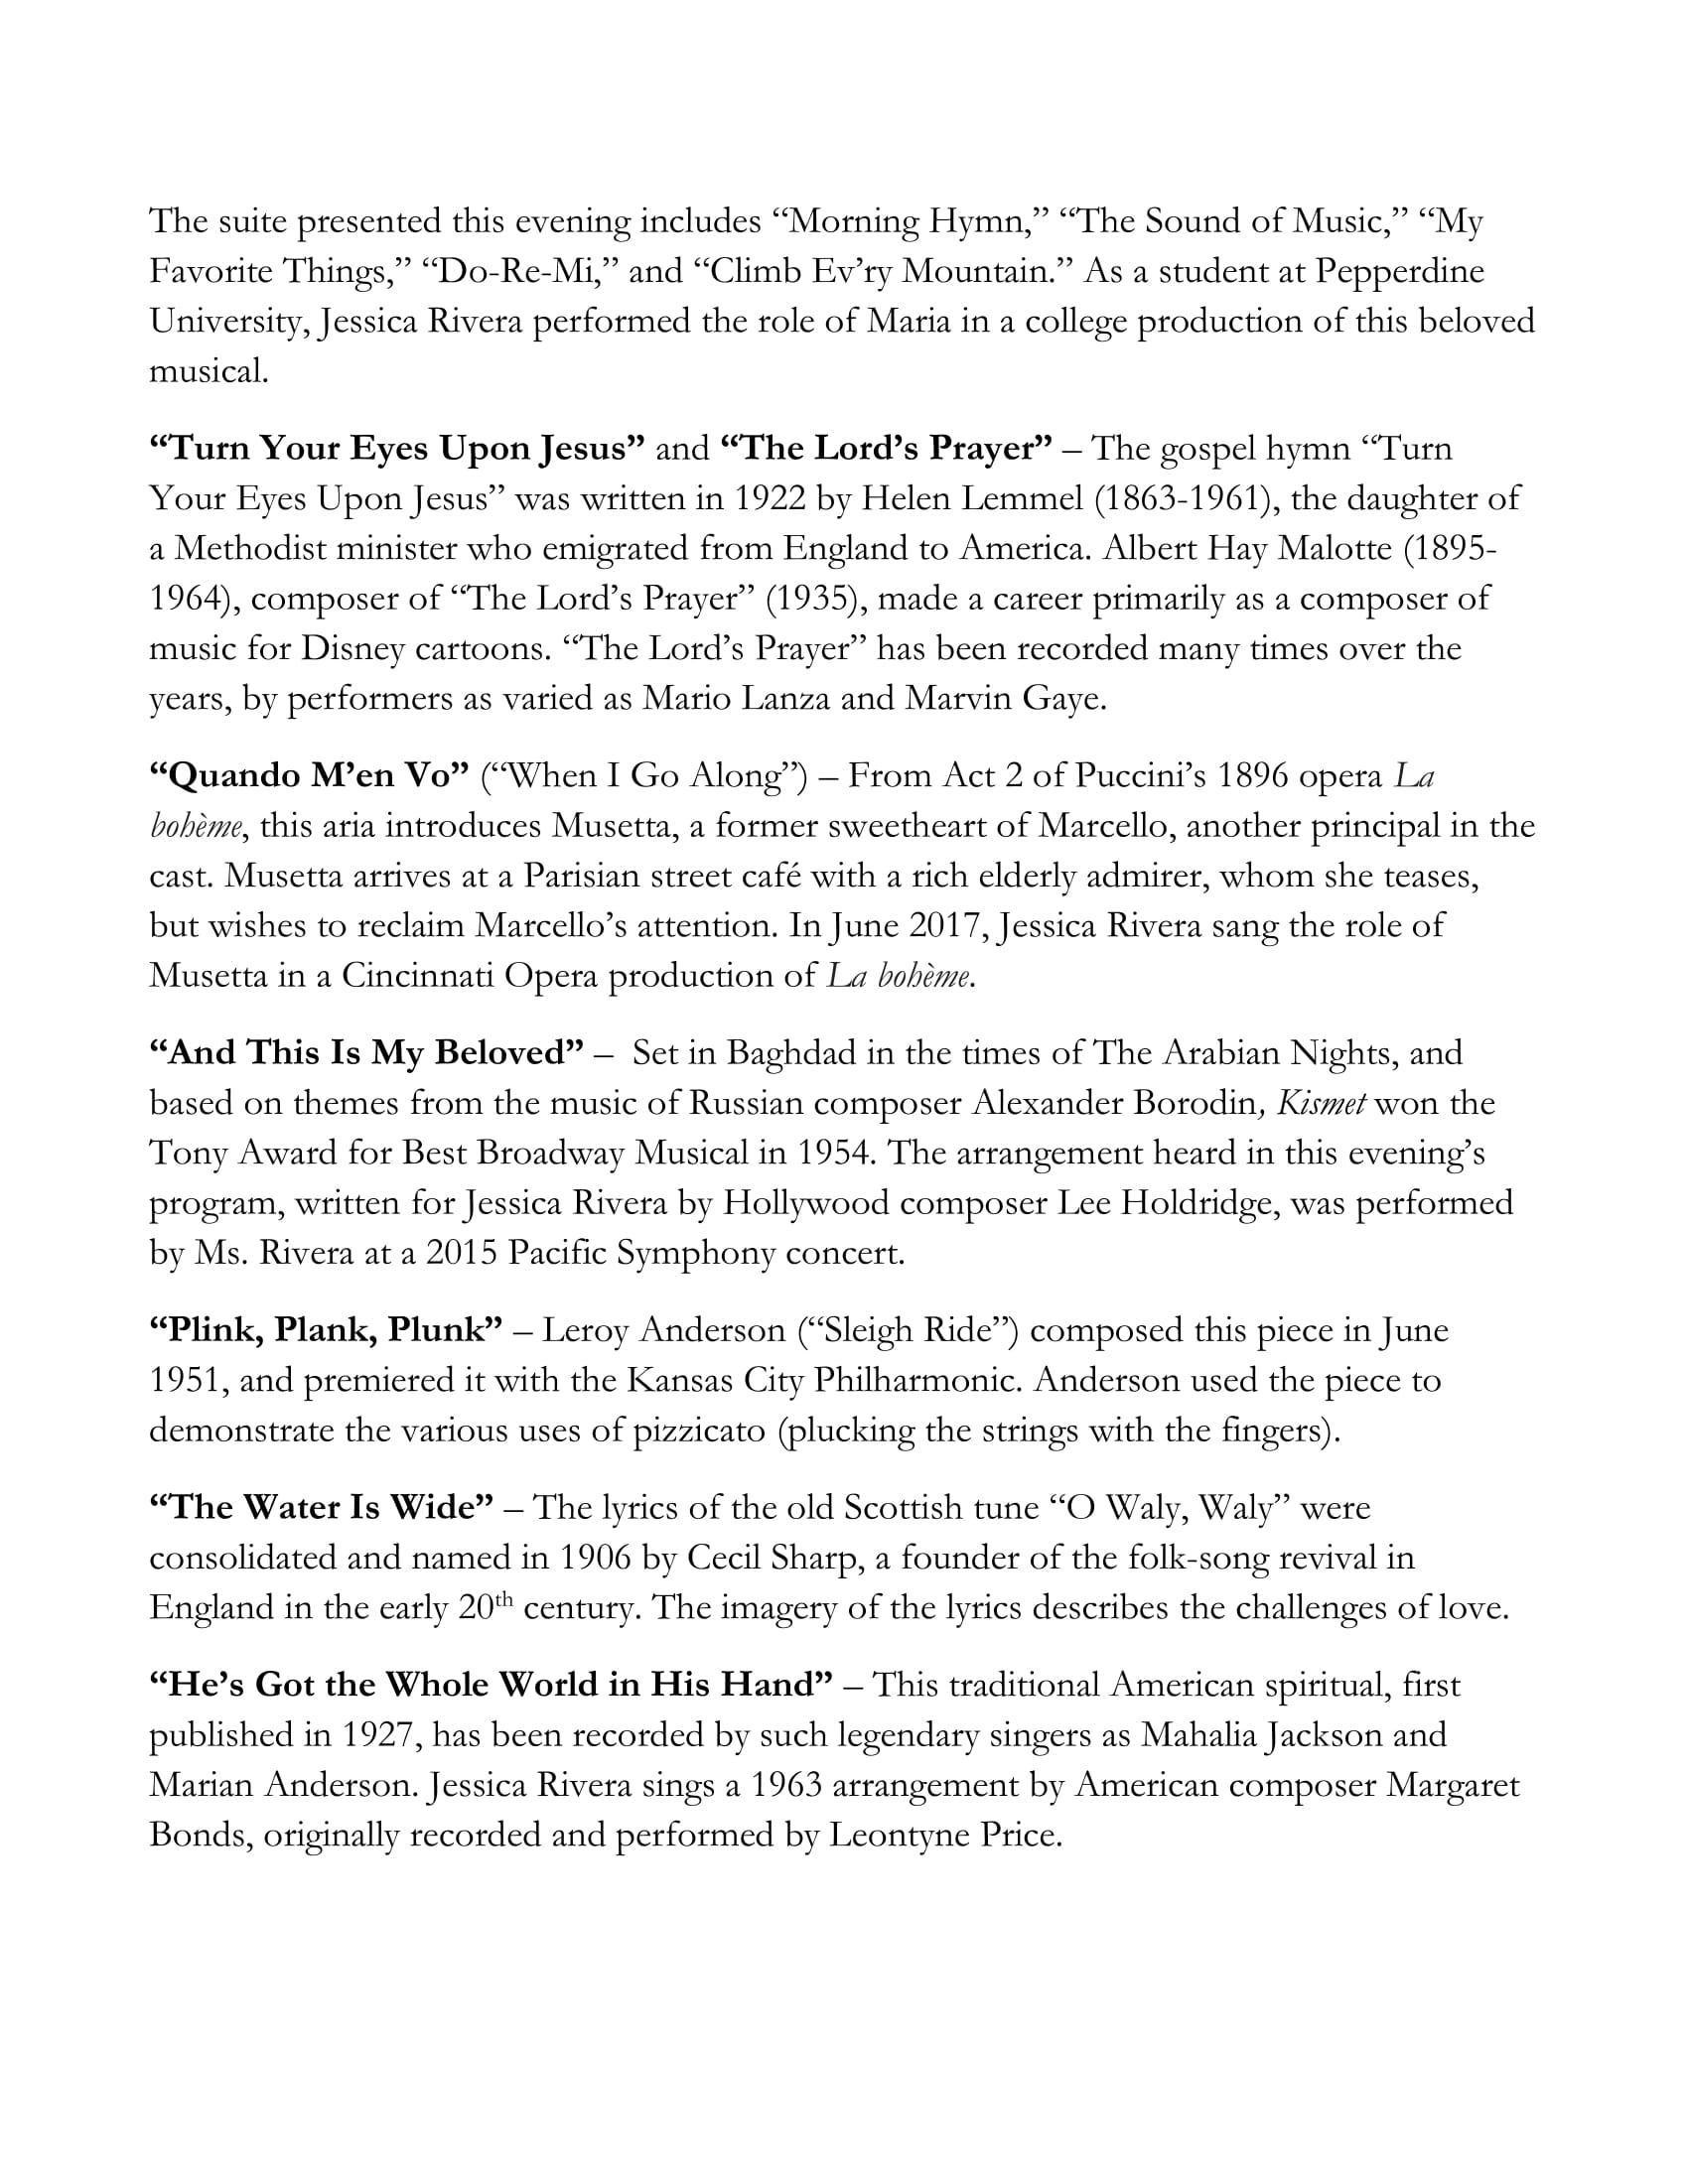 Page-07-1.jpg